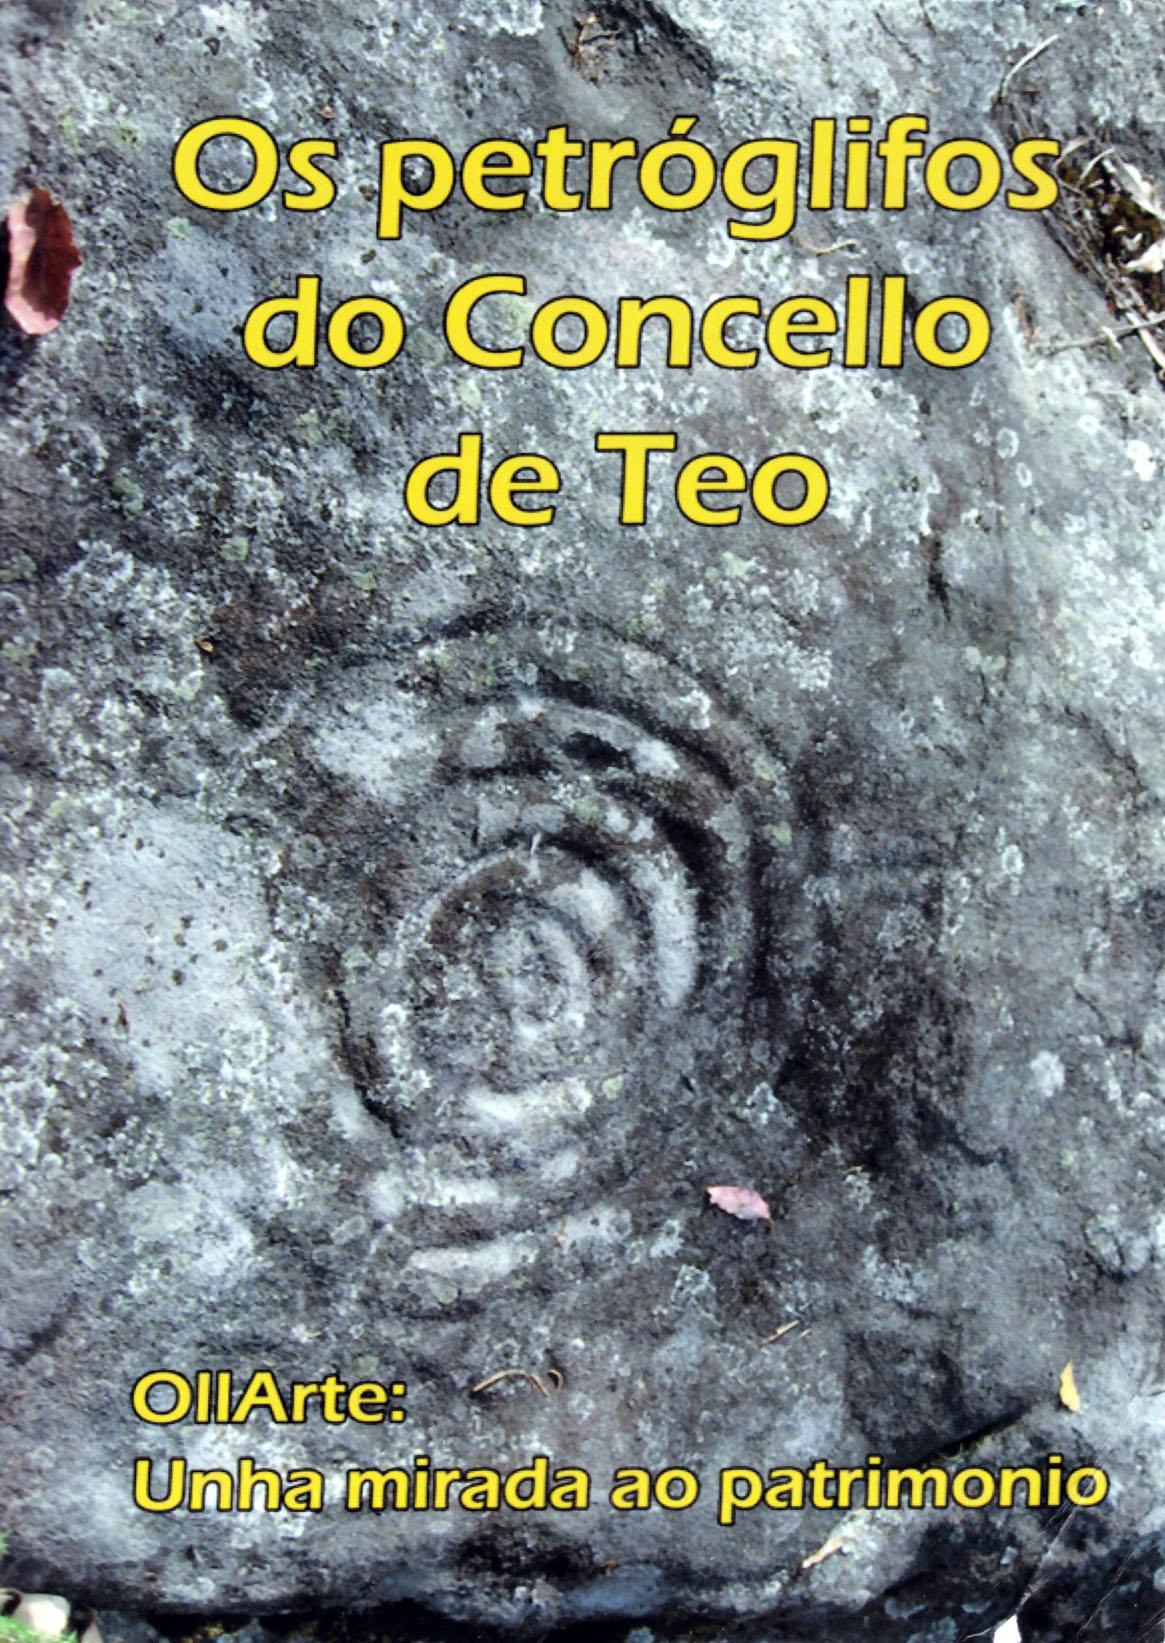 Guía «Os Petróglifos de Teo» 2008.